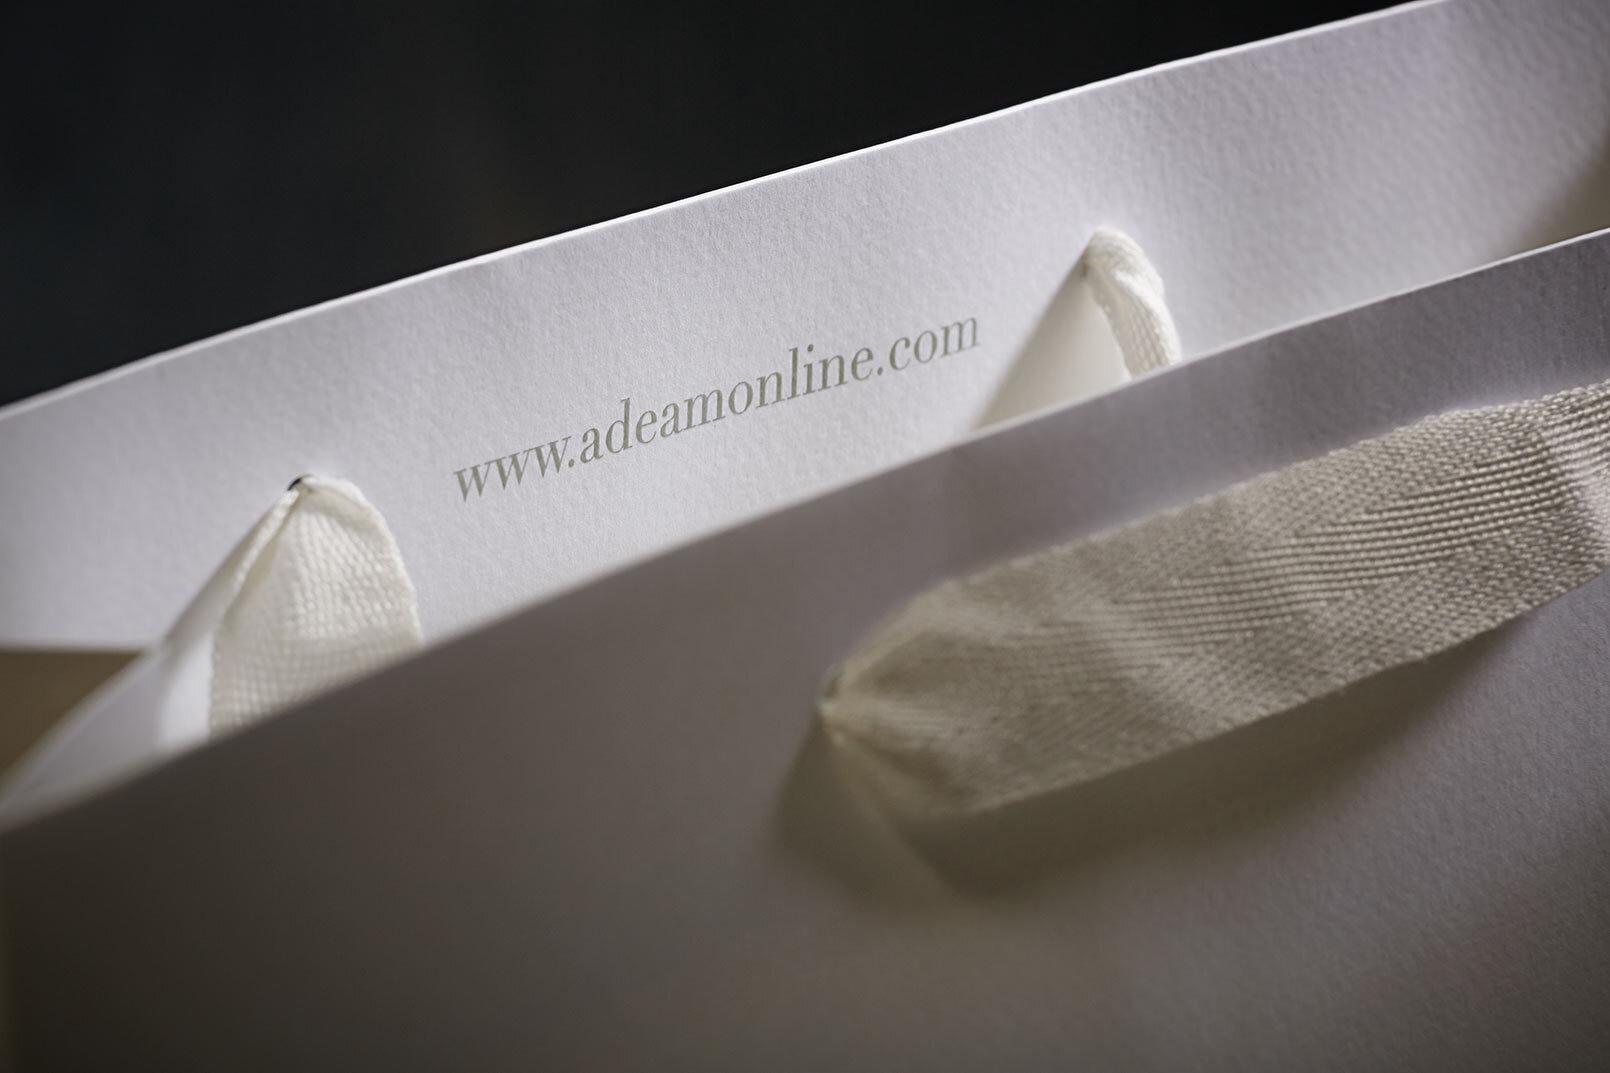 Adeam-Shopping-Bag-Design-Packaging-Company-2.JPG